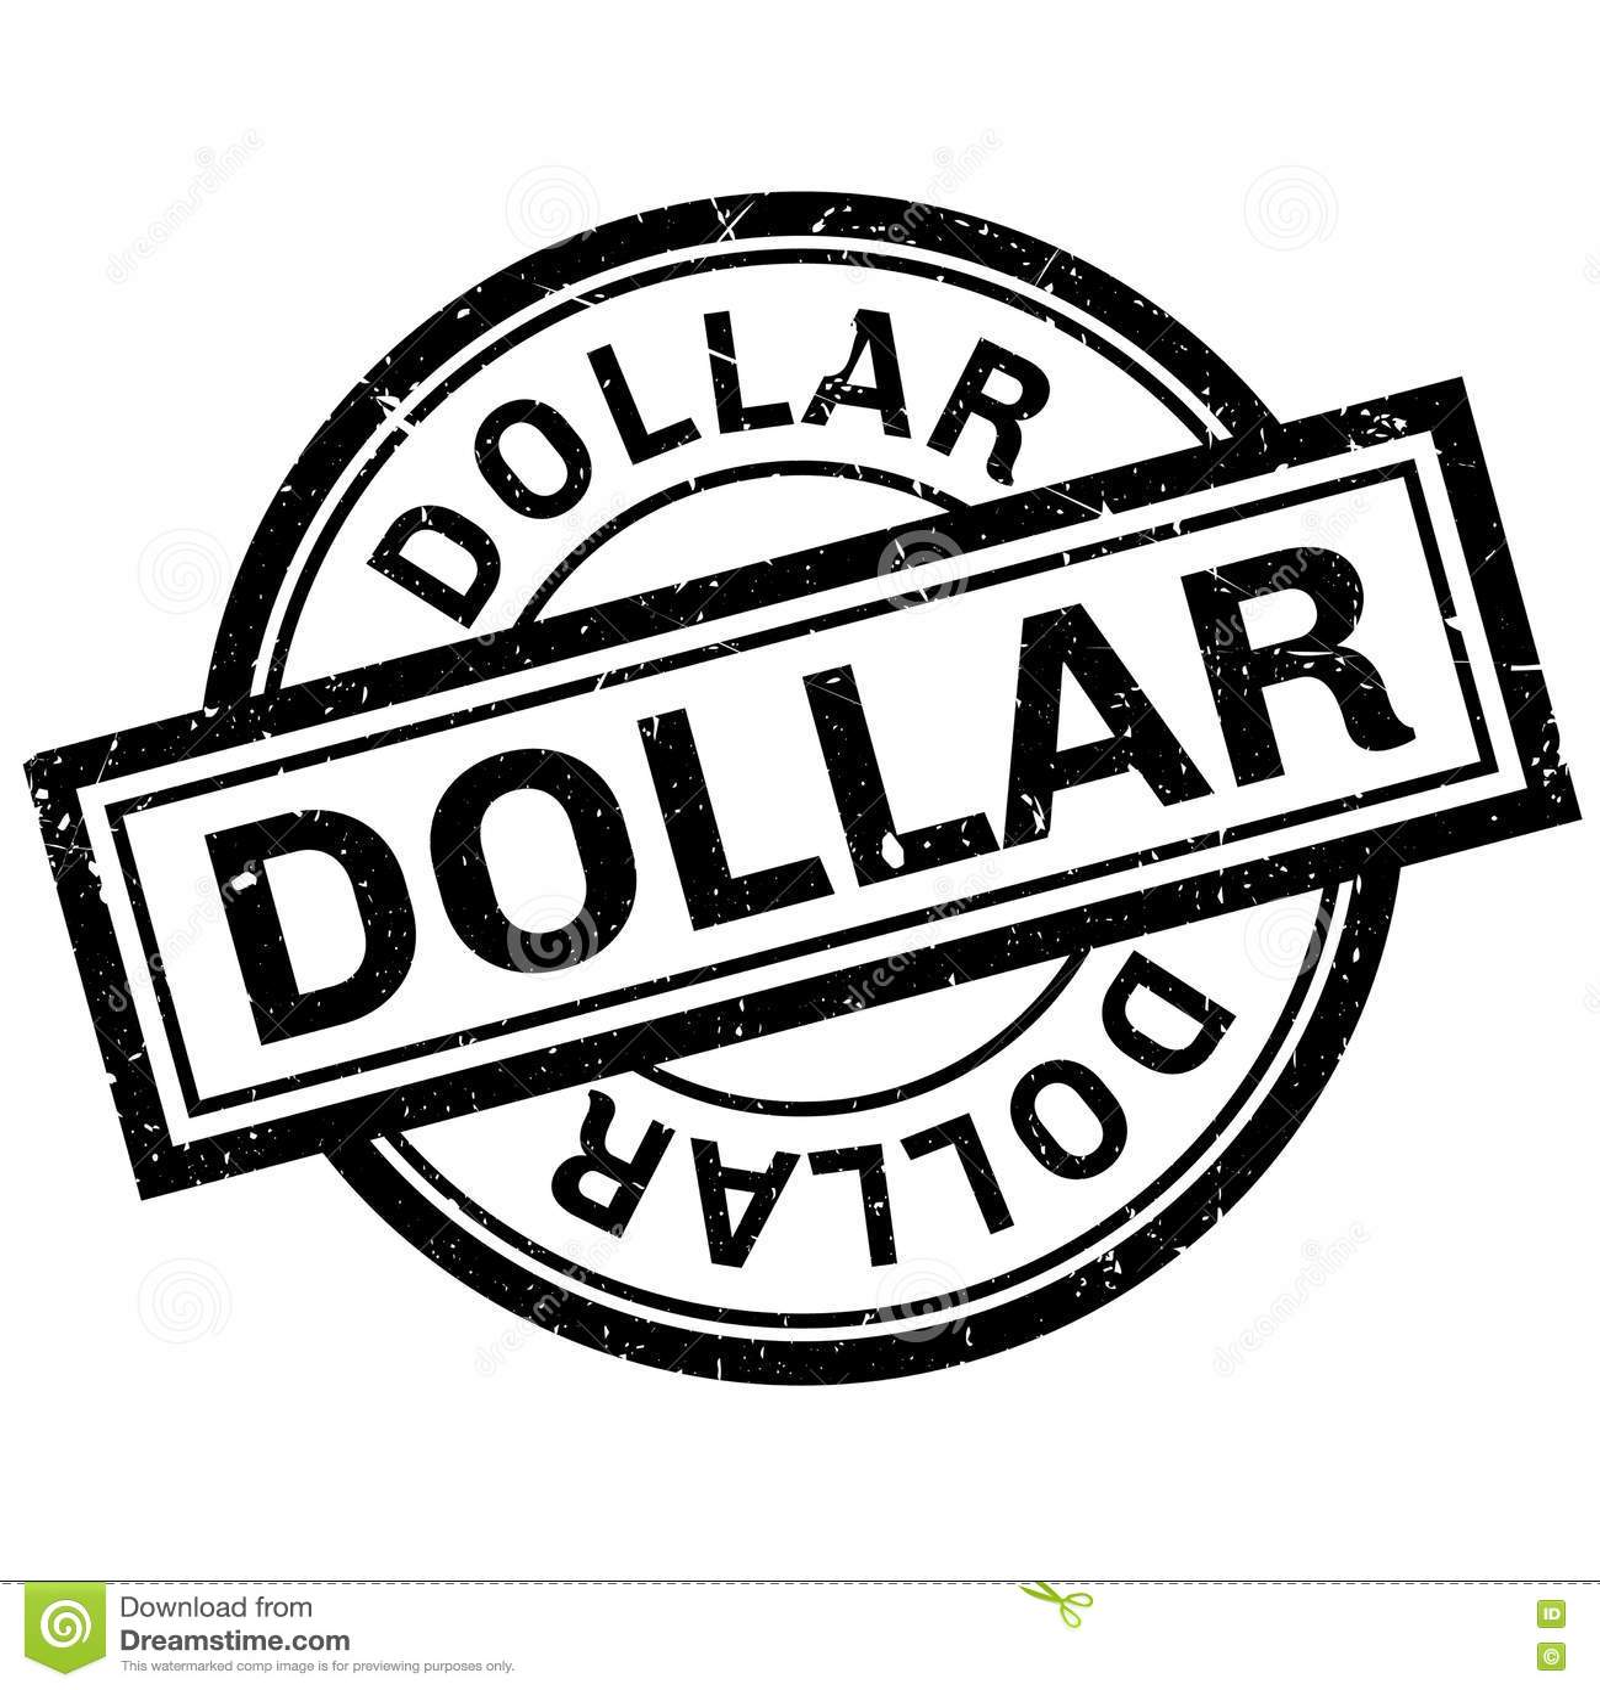 Dollar Symbol On Rubber Stamp Stock Image